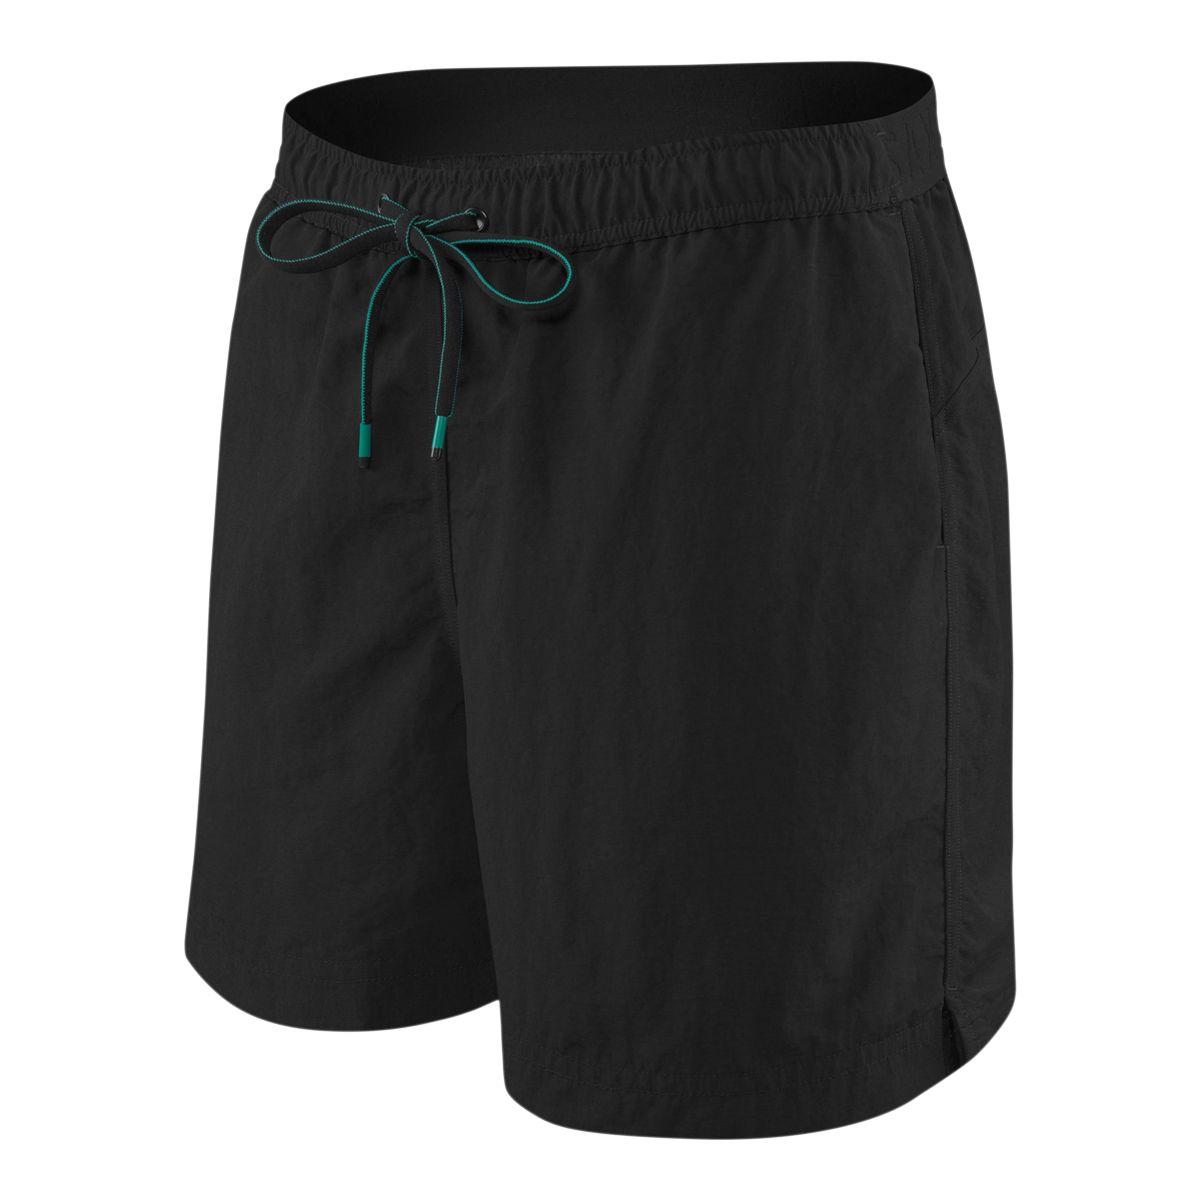 Cannonball 2N1 Short - Men's